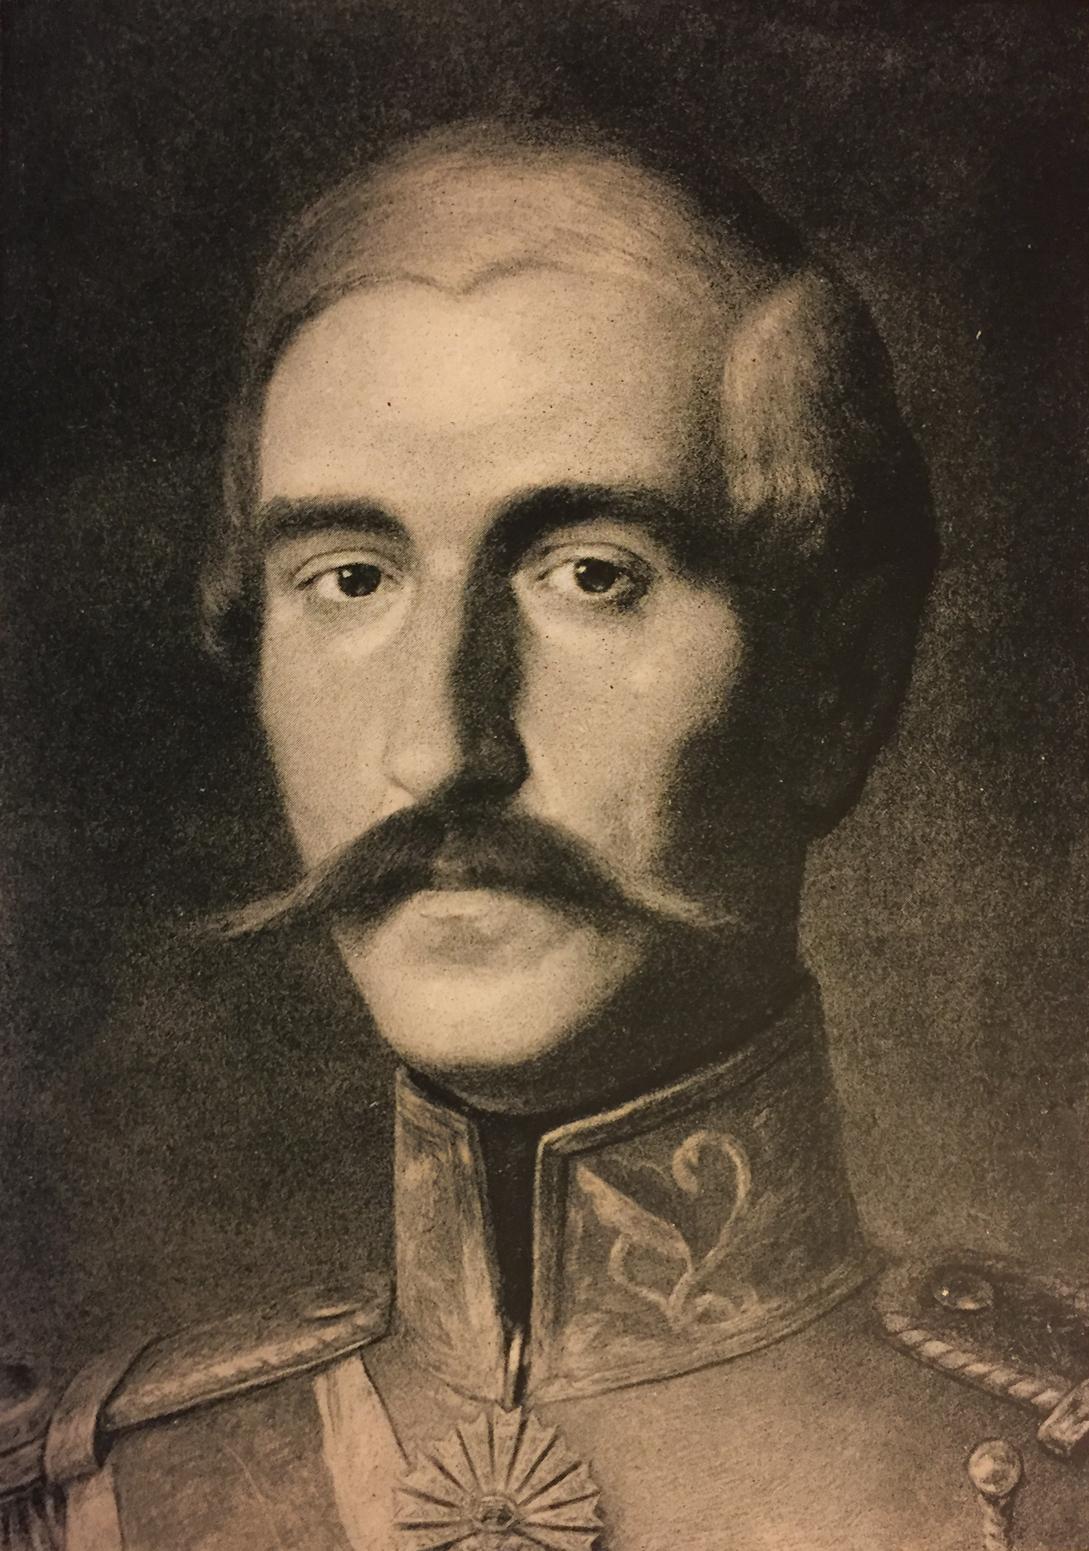 Knez Aleksandar Karađorđević 1806-1885, portret